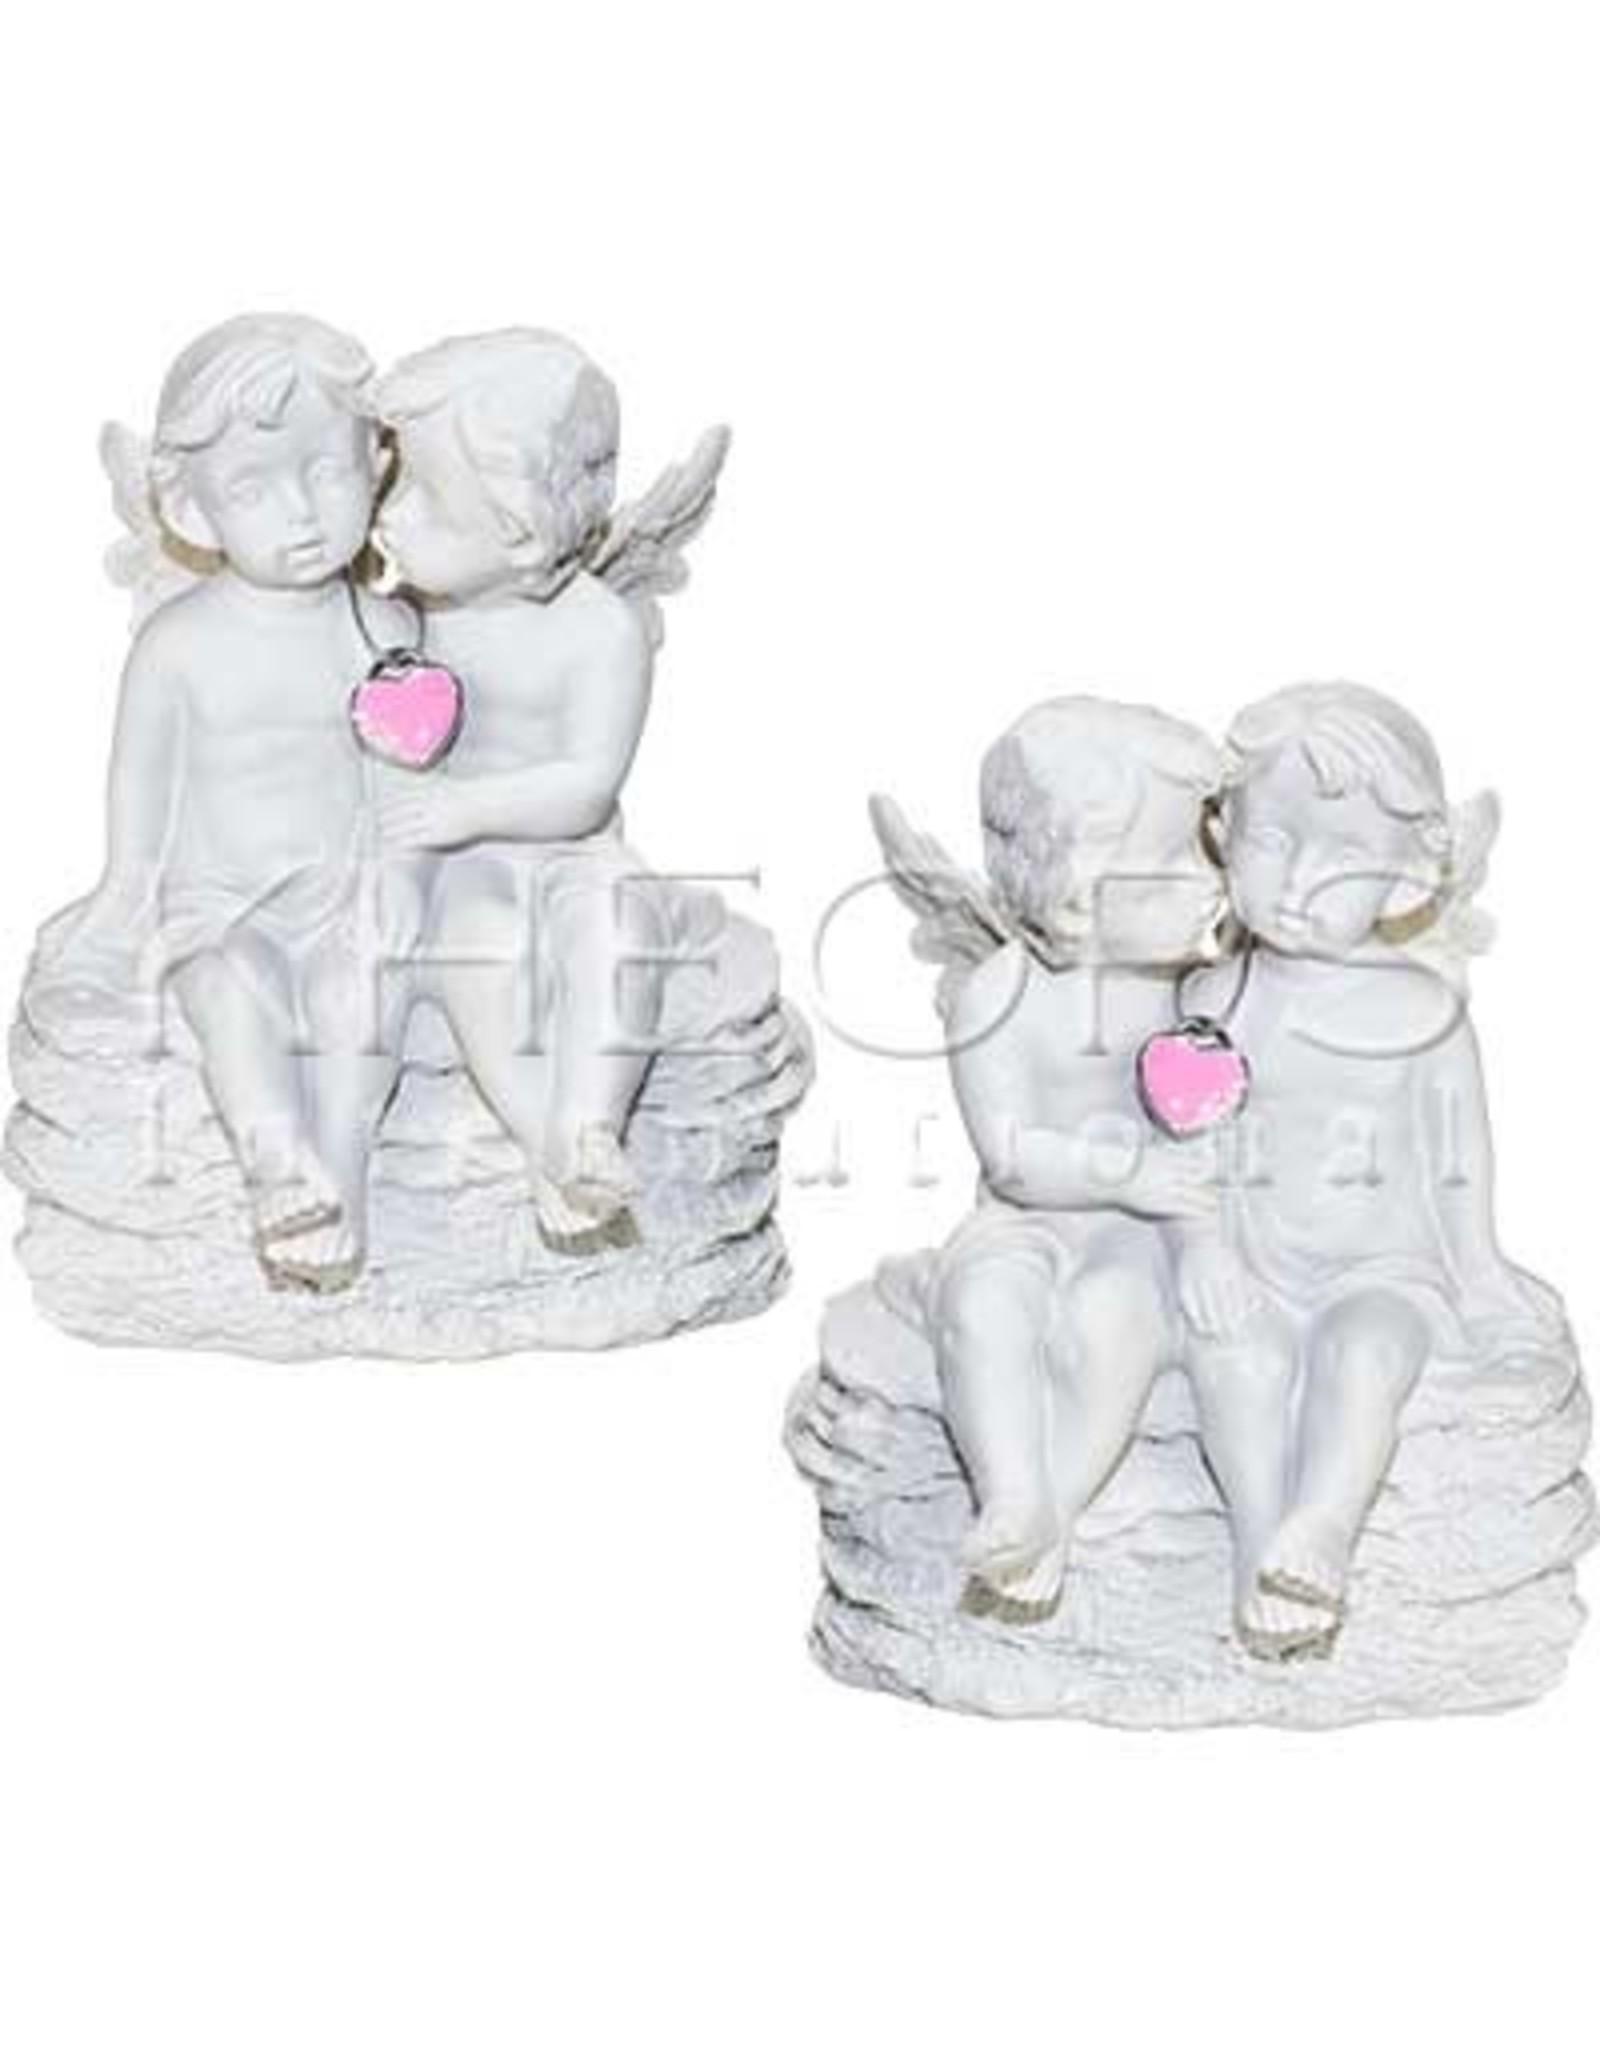 Kheops Resin Angels of Love